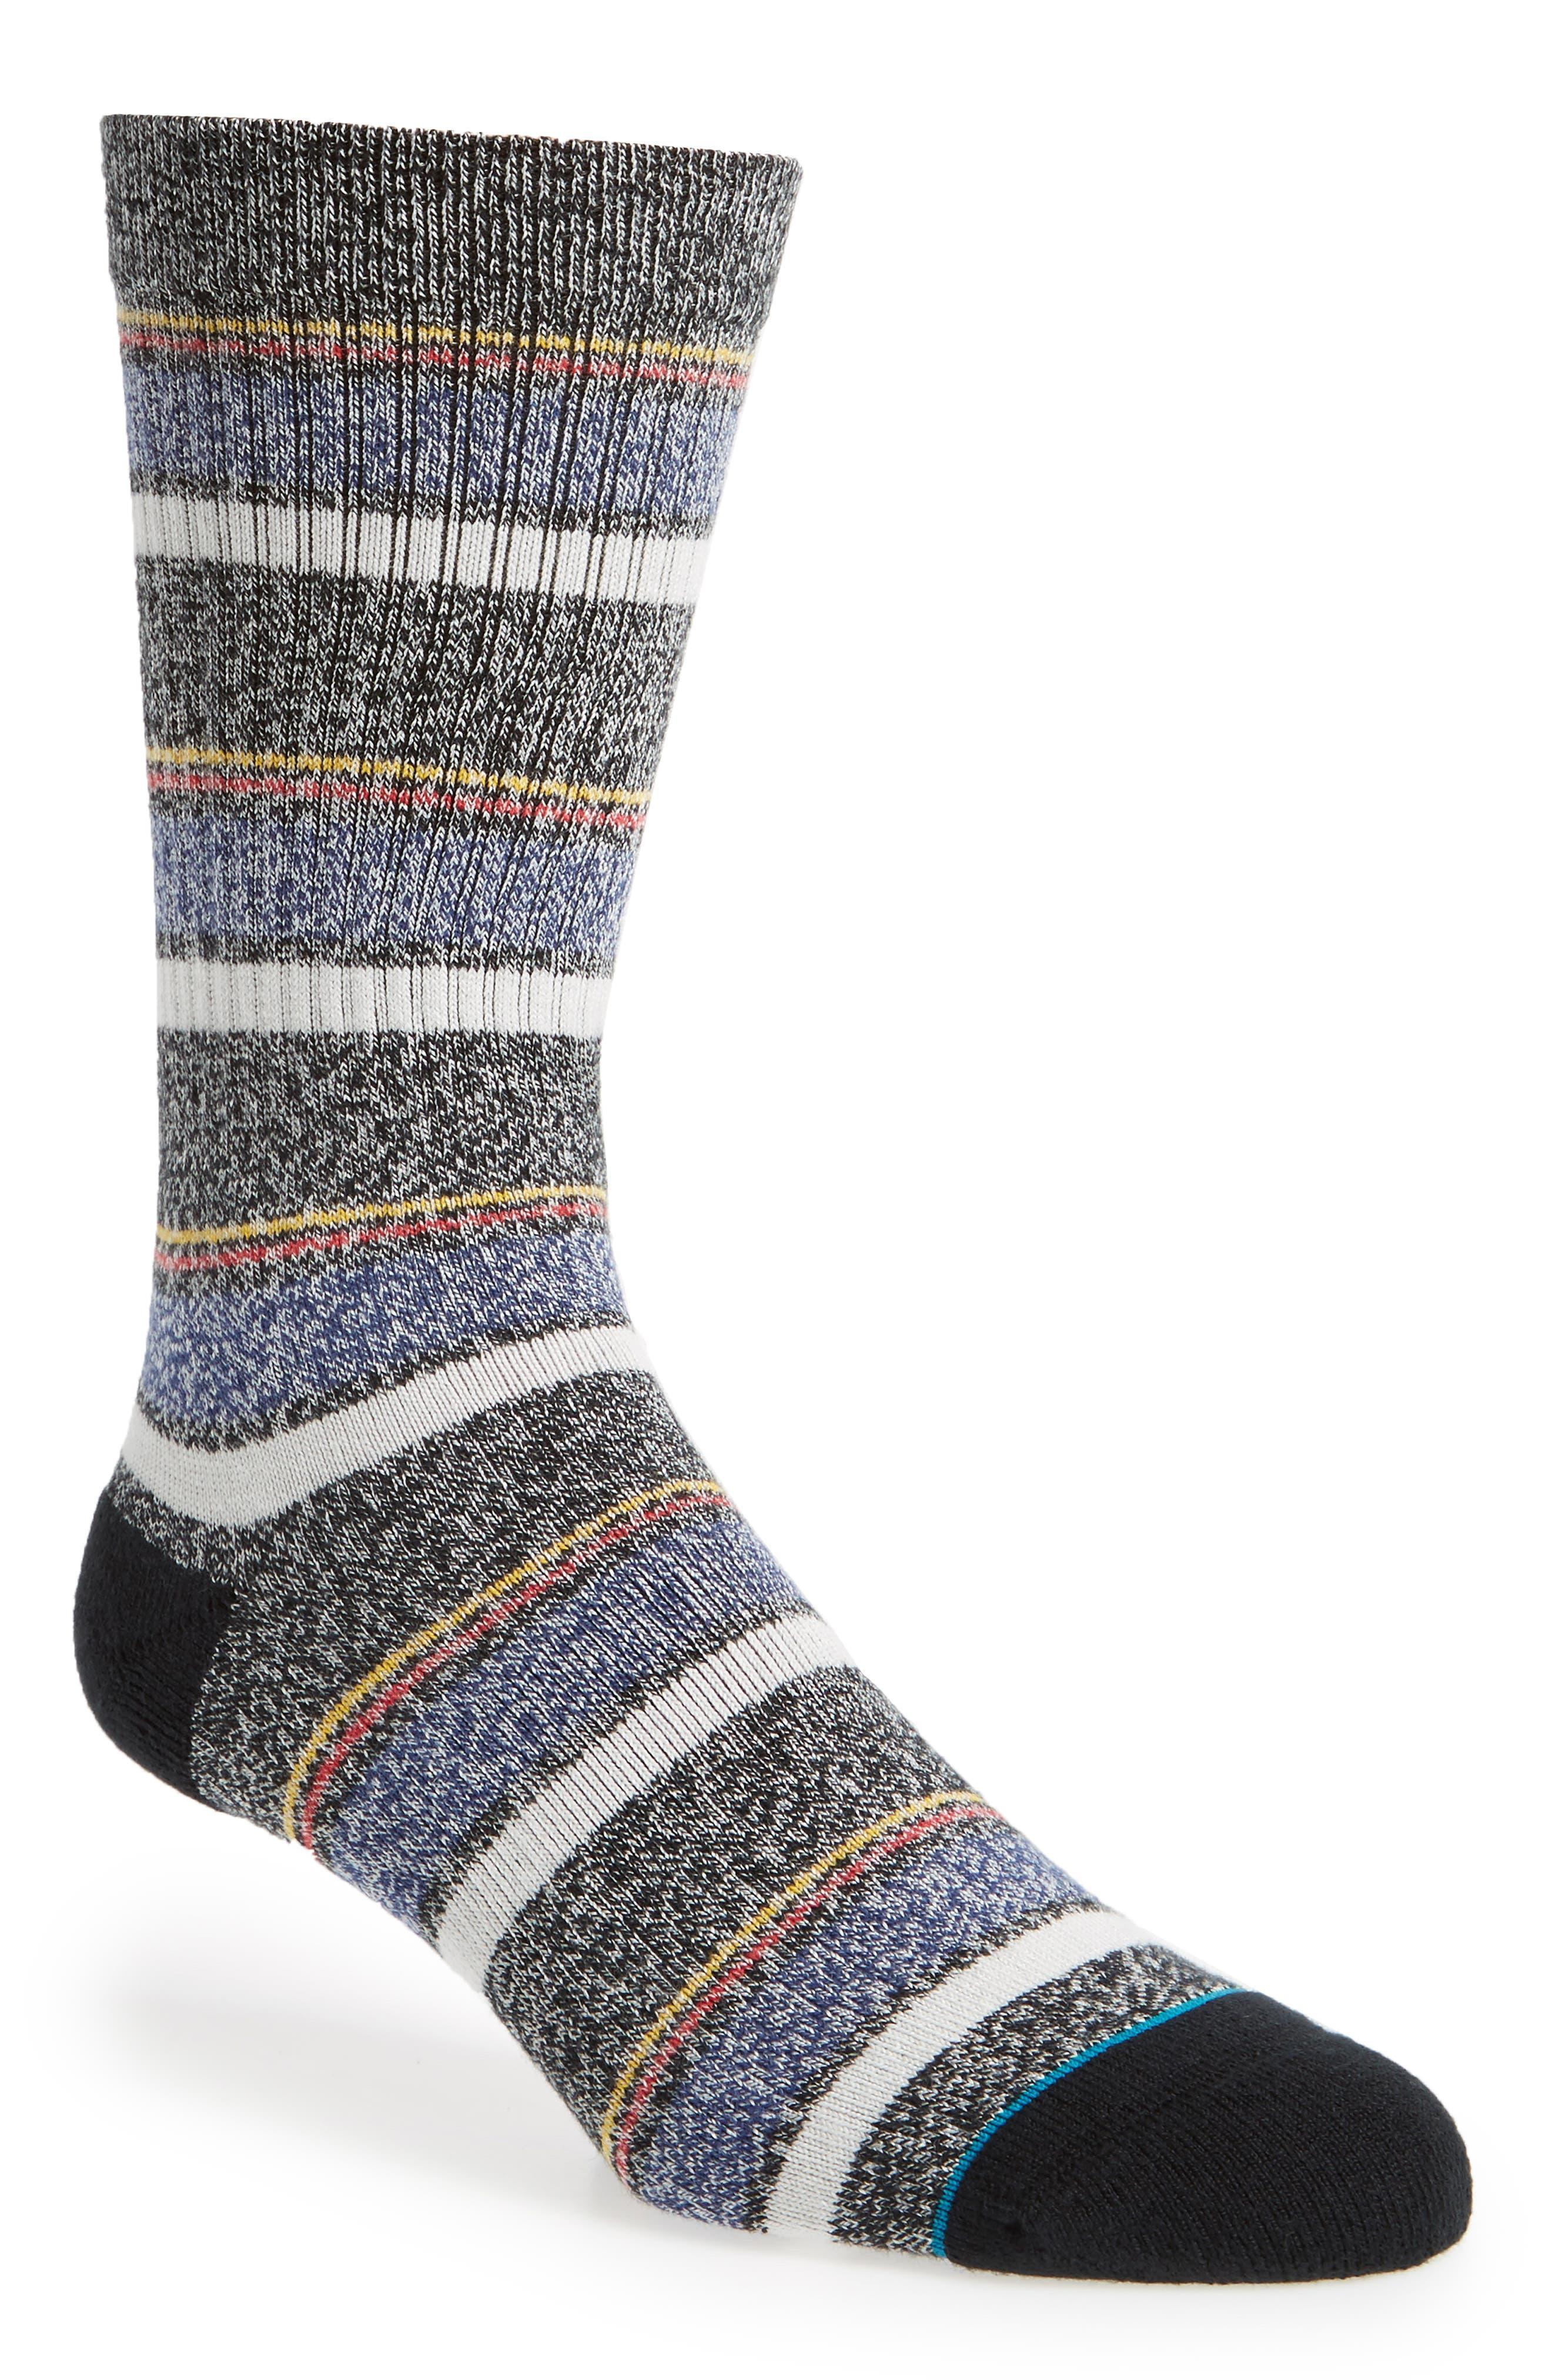 Stance Keating Stripe Socks Wide Range Of Online Buy Cheap The Cheapest eQWVQD